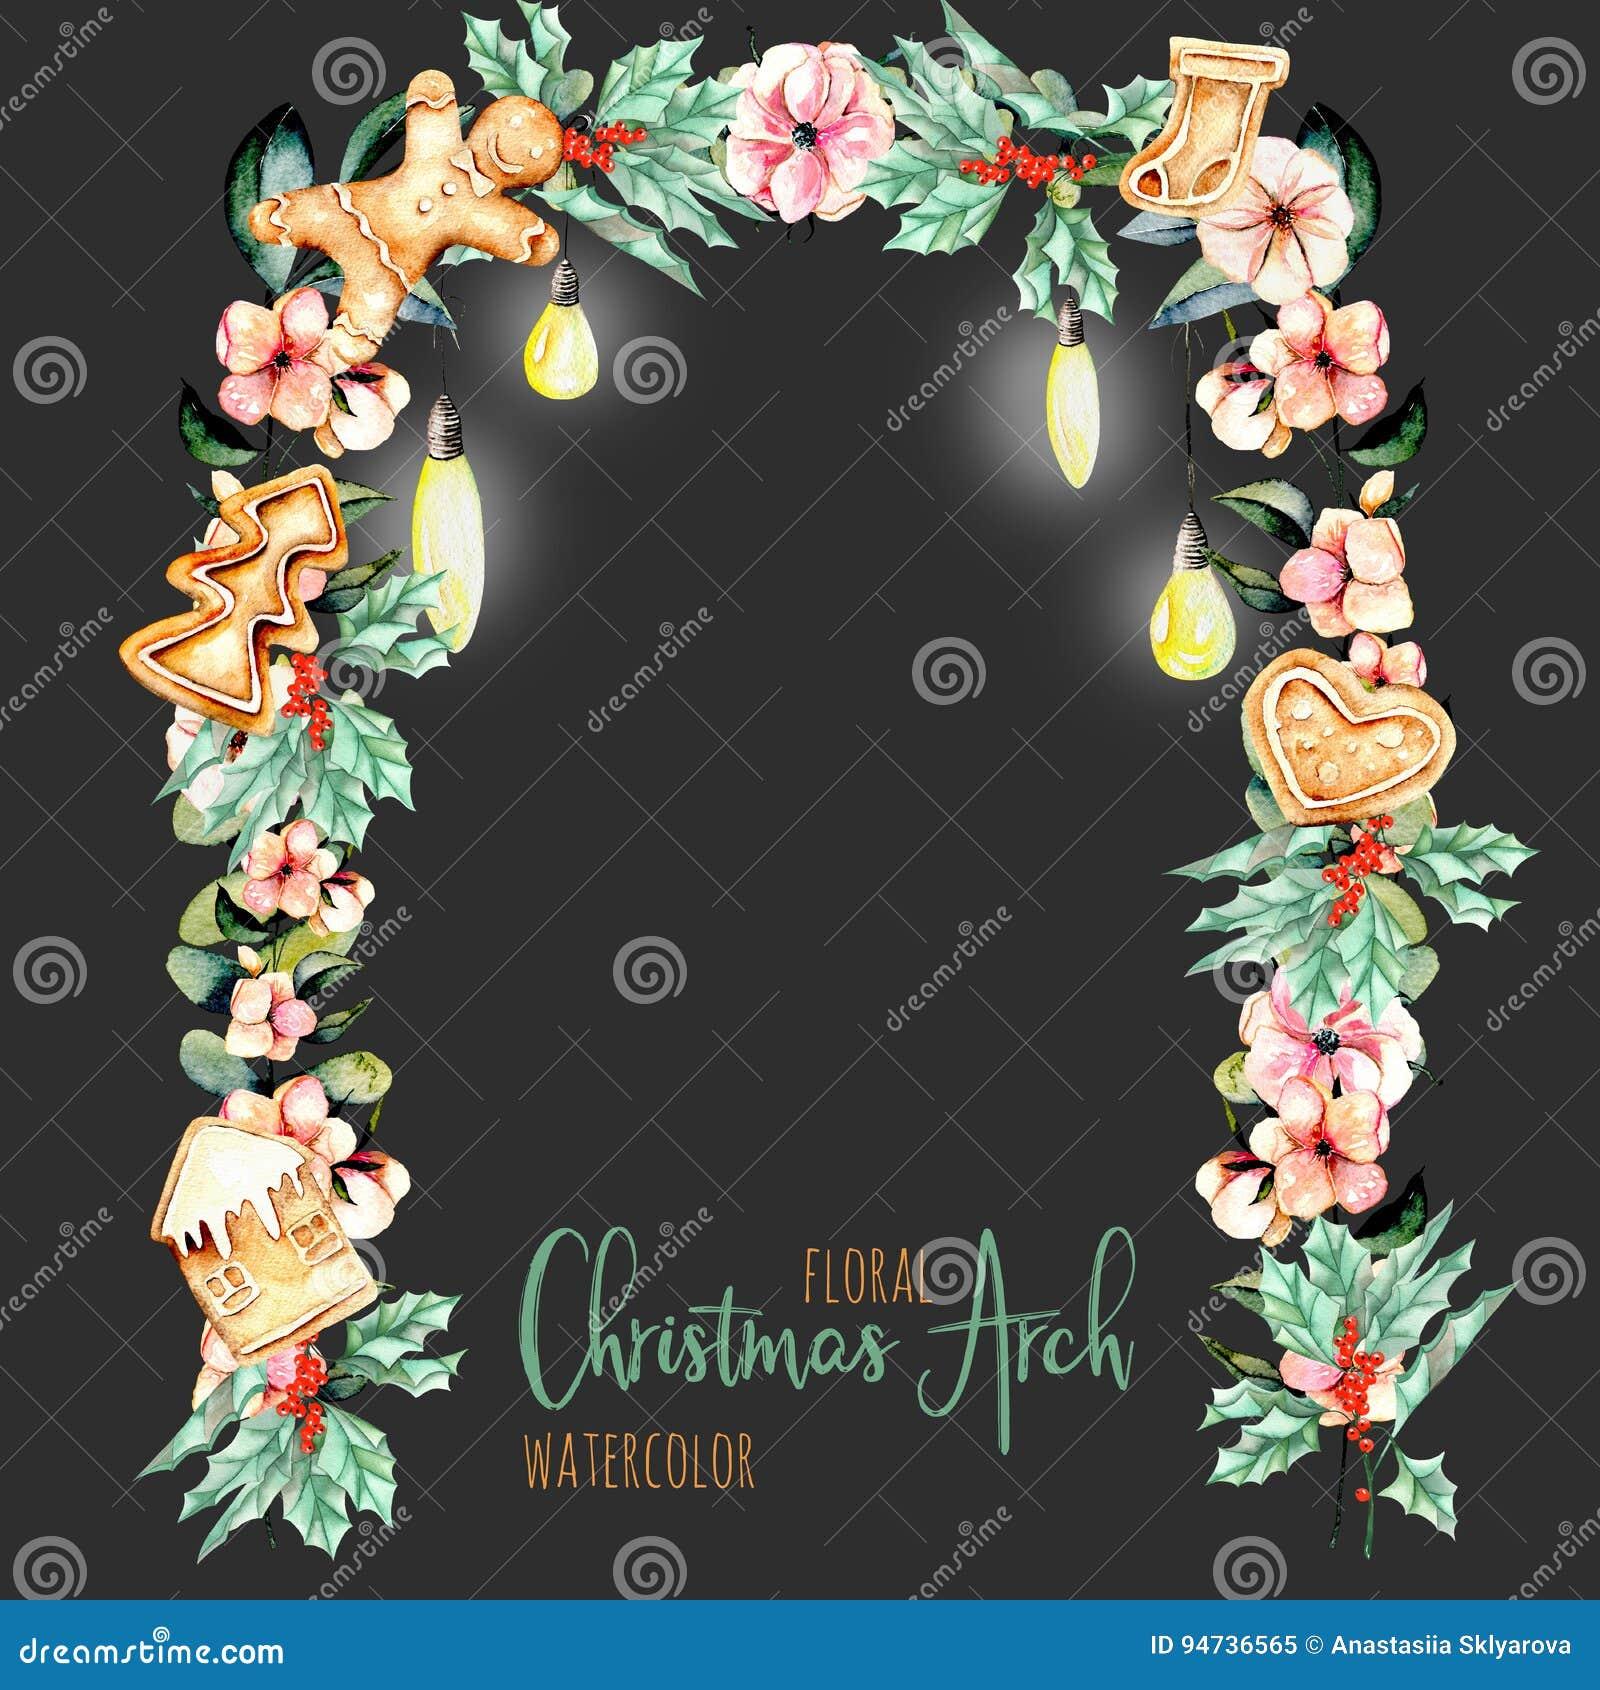 Floral αψίδα Χριστουγέννων Watercolor με την ένωση των λαμπτήρων για το σχέδιο διακοπών